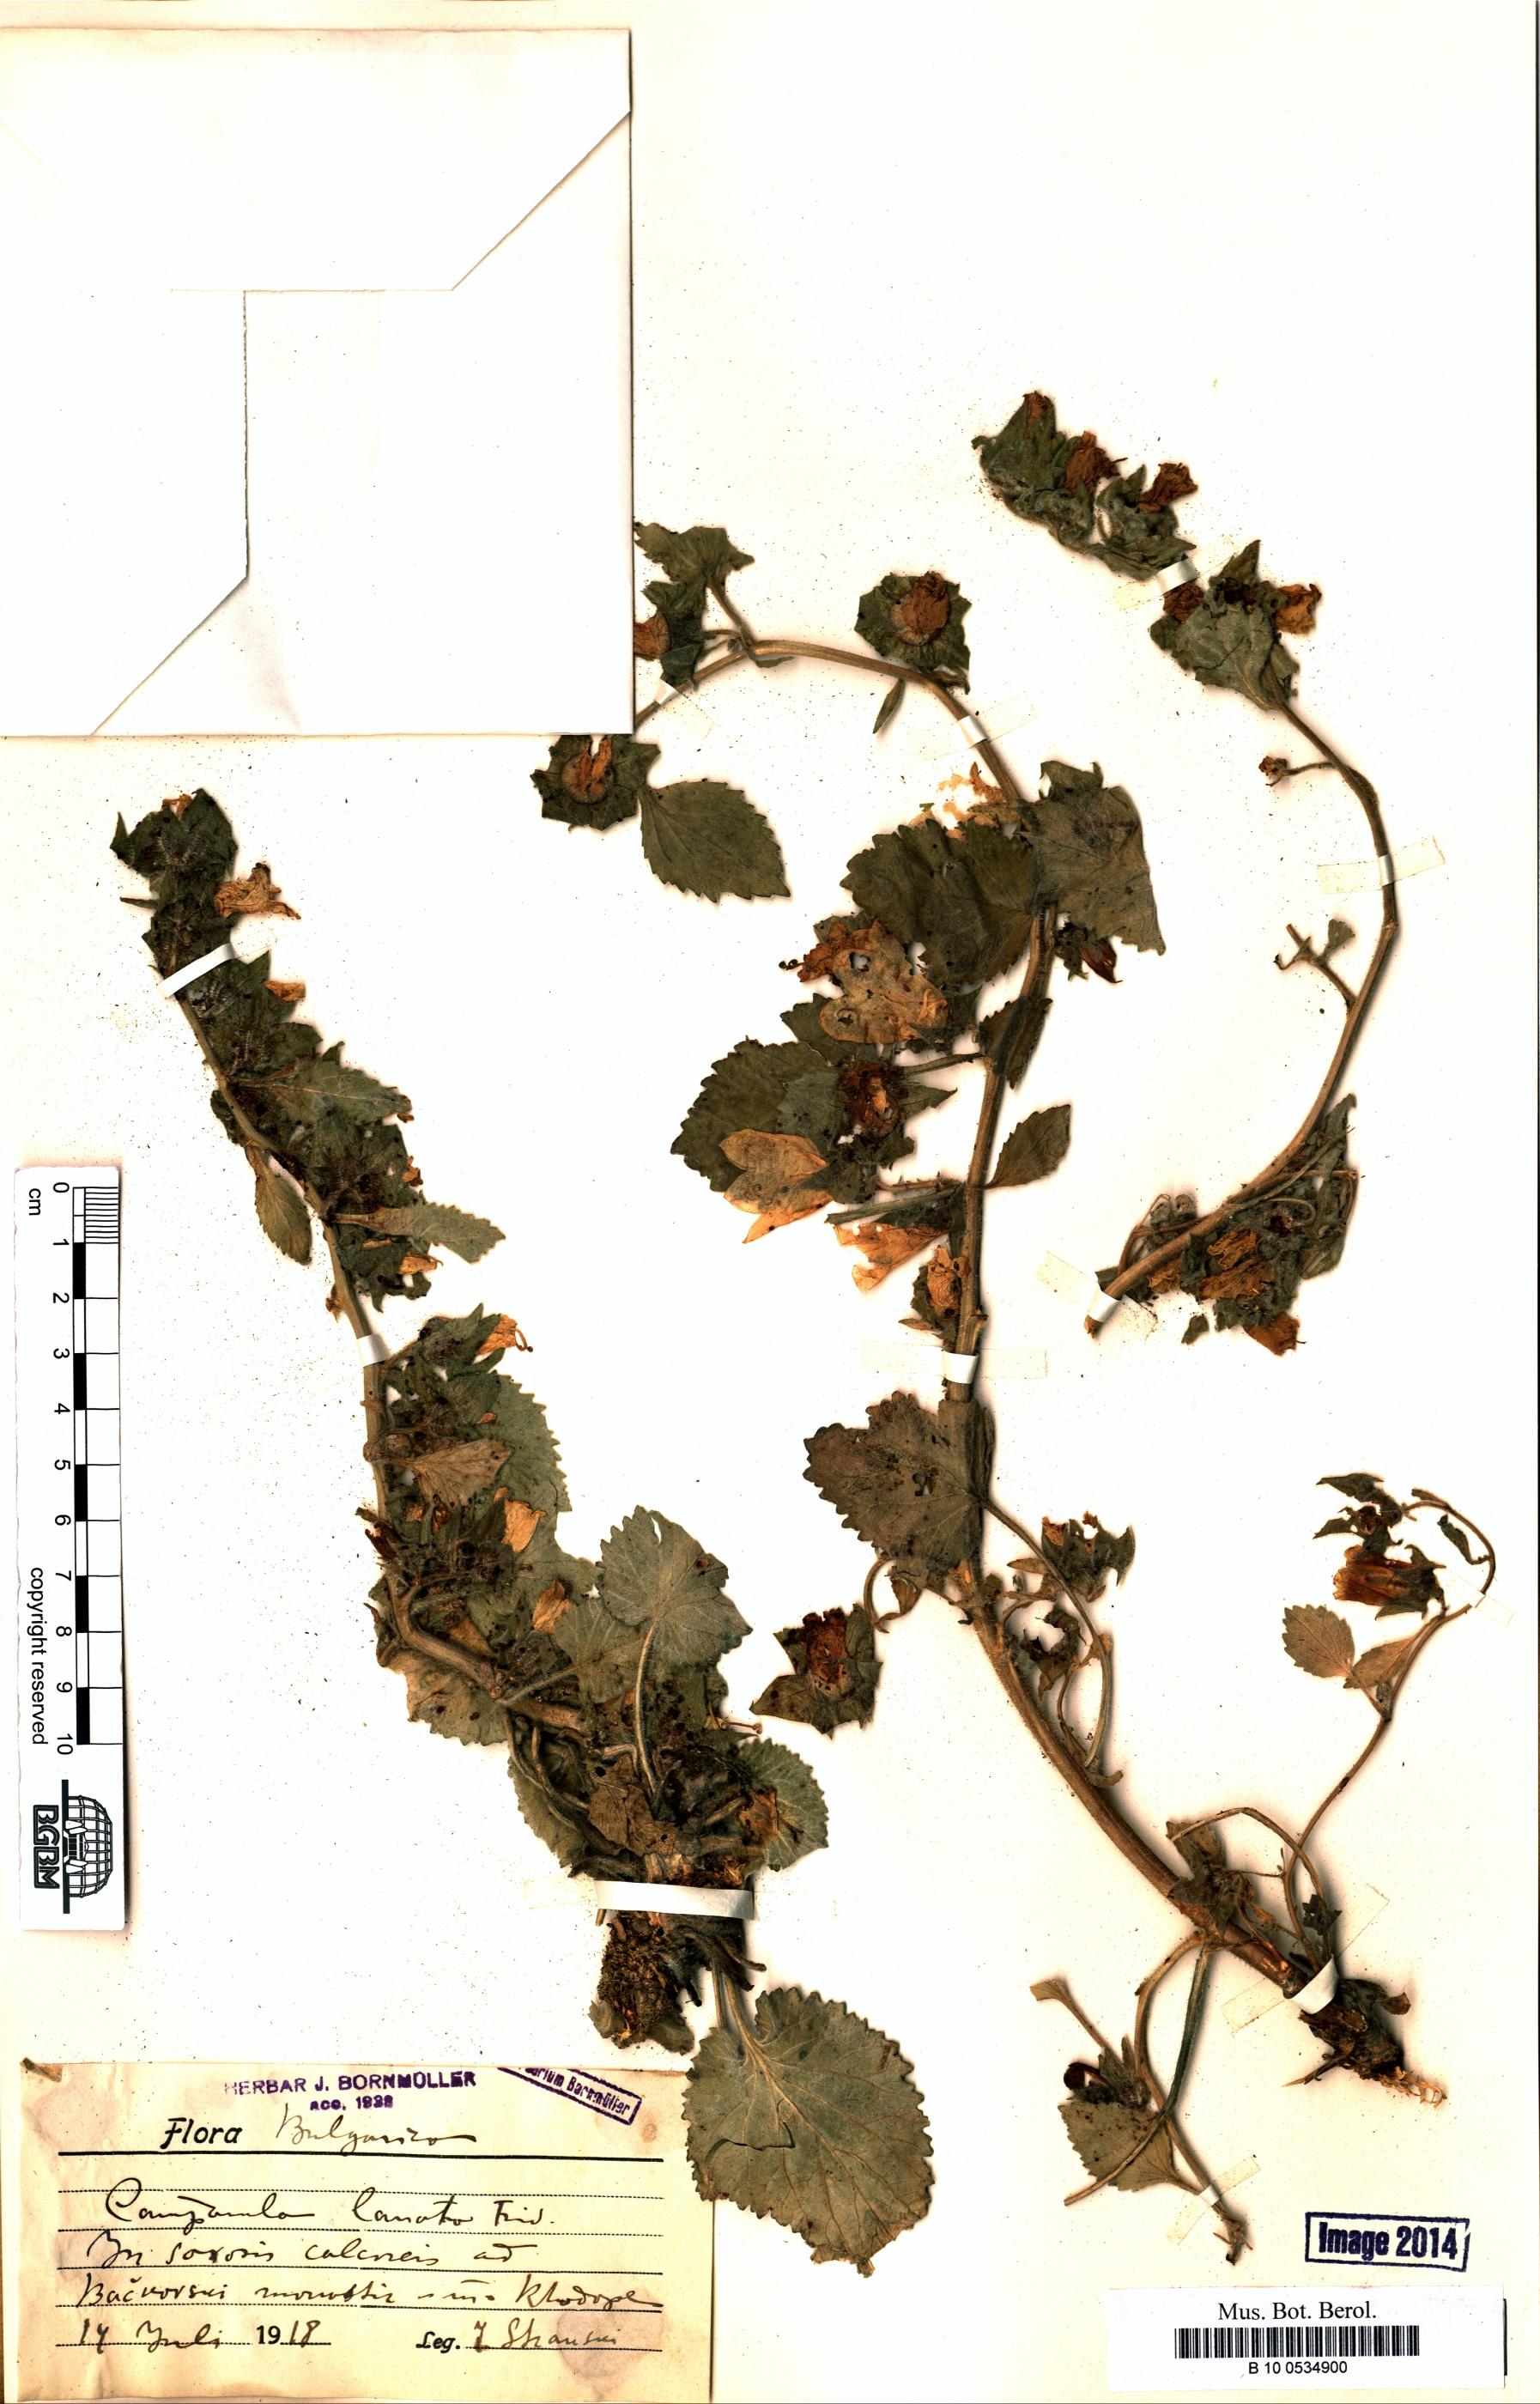 http://ww2.bgbm.org/herbarium/images/B/10/05/34/90/B_10_0534900.jpg